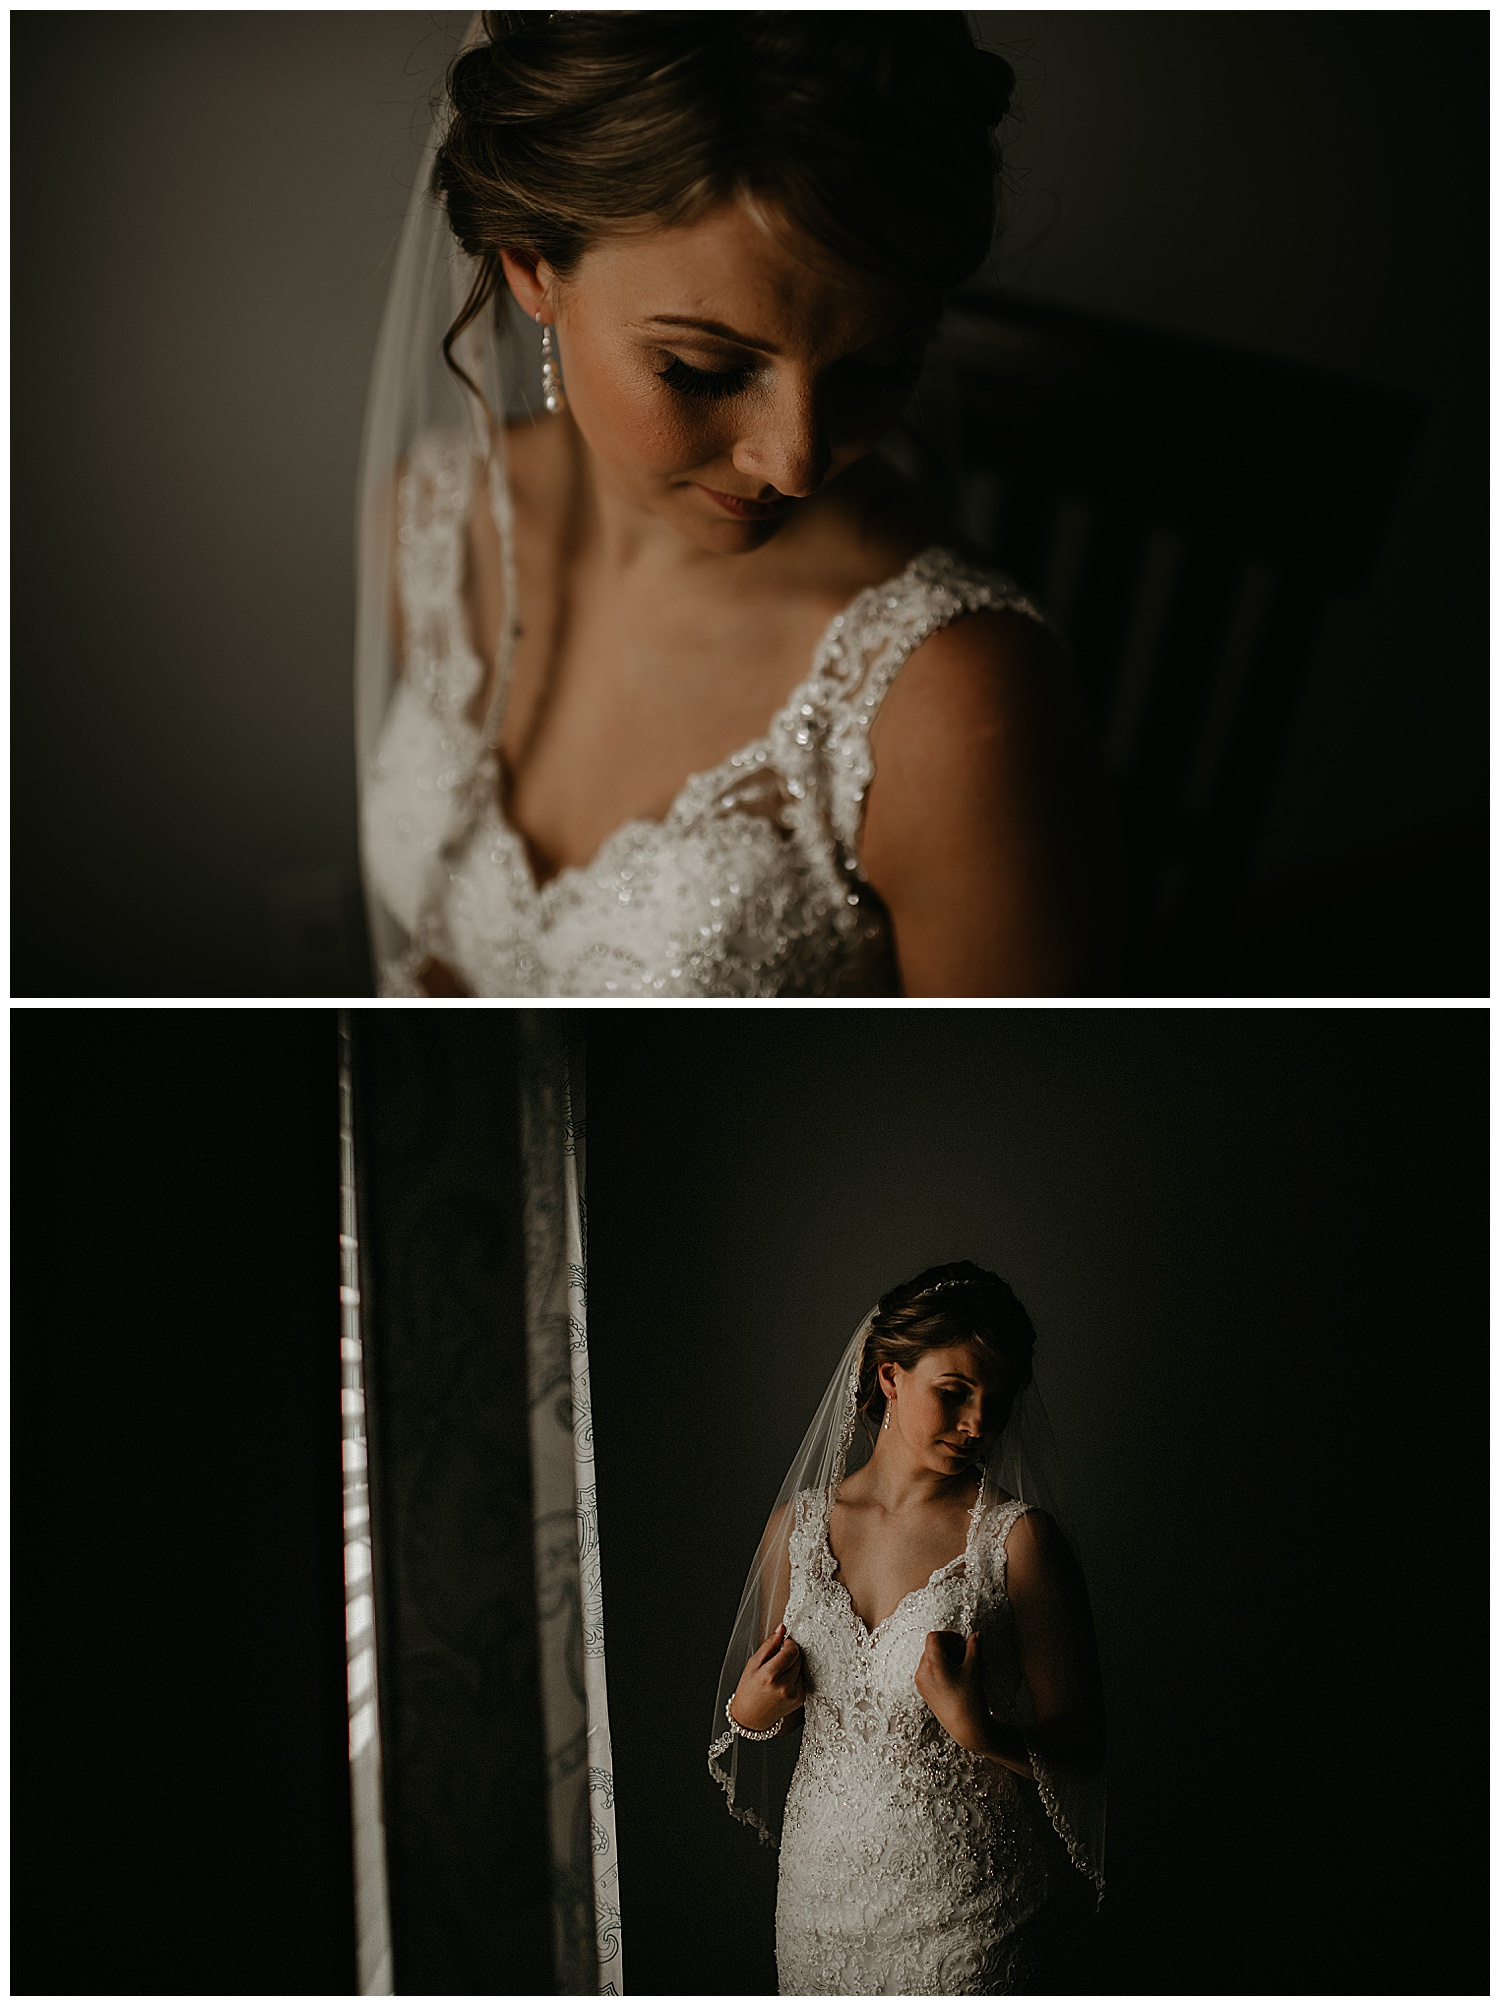 NEPA-Lehigh-Valley-Wedding-Photographer-at-Fountain-Springs-Country-Inn-Ashland-PA_0017.jpg